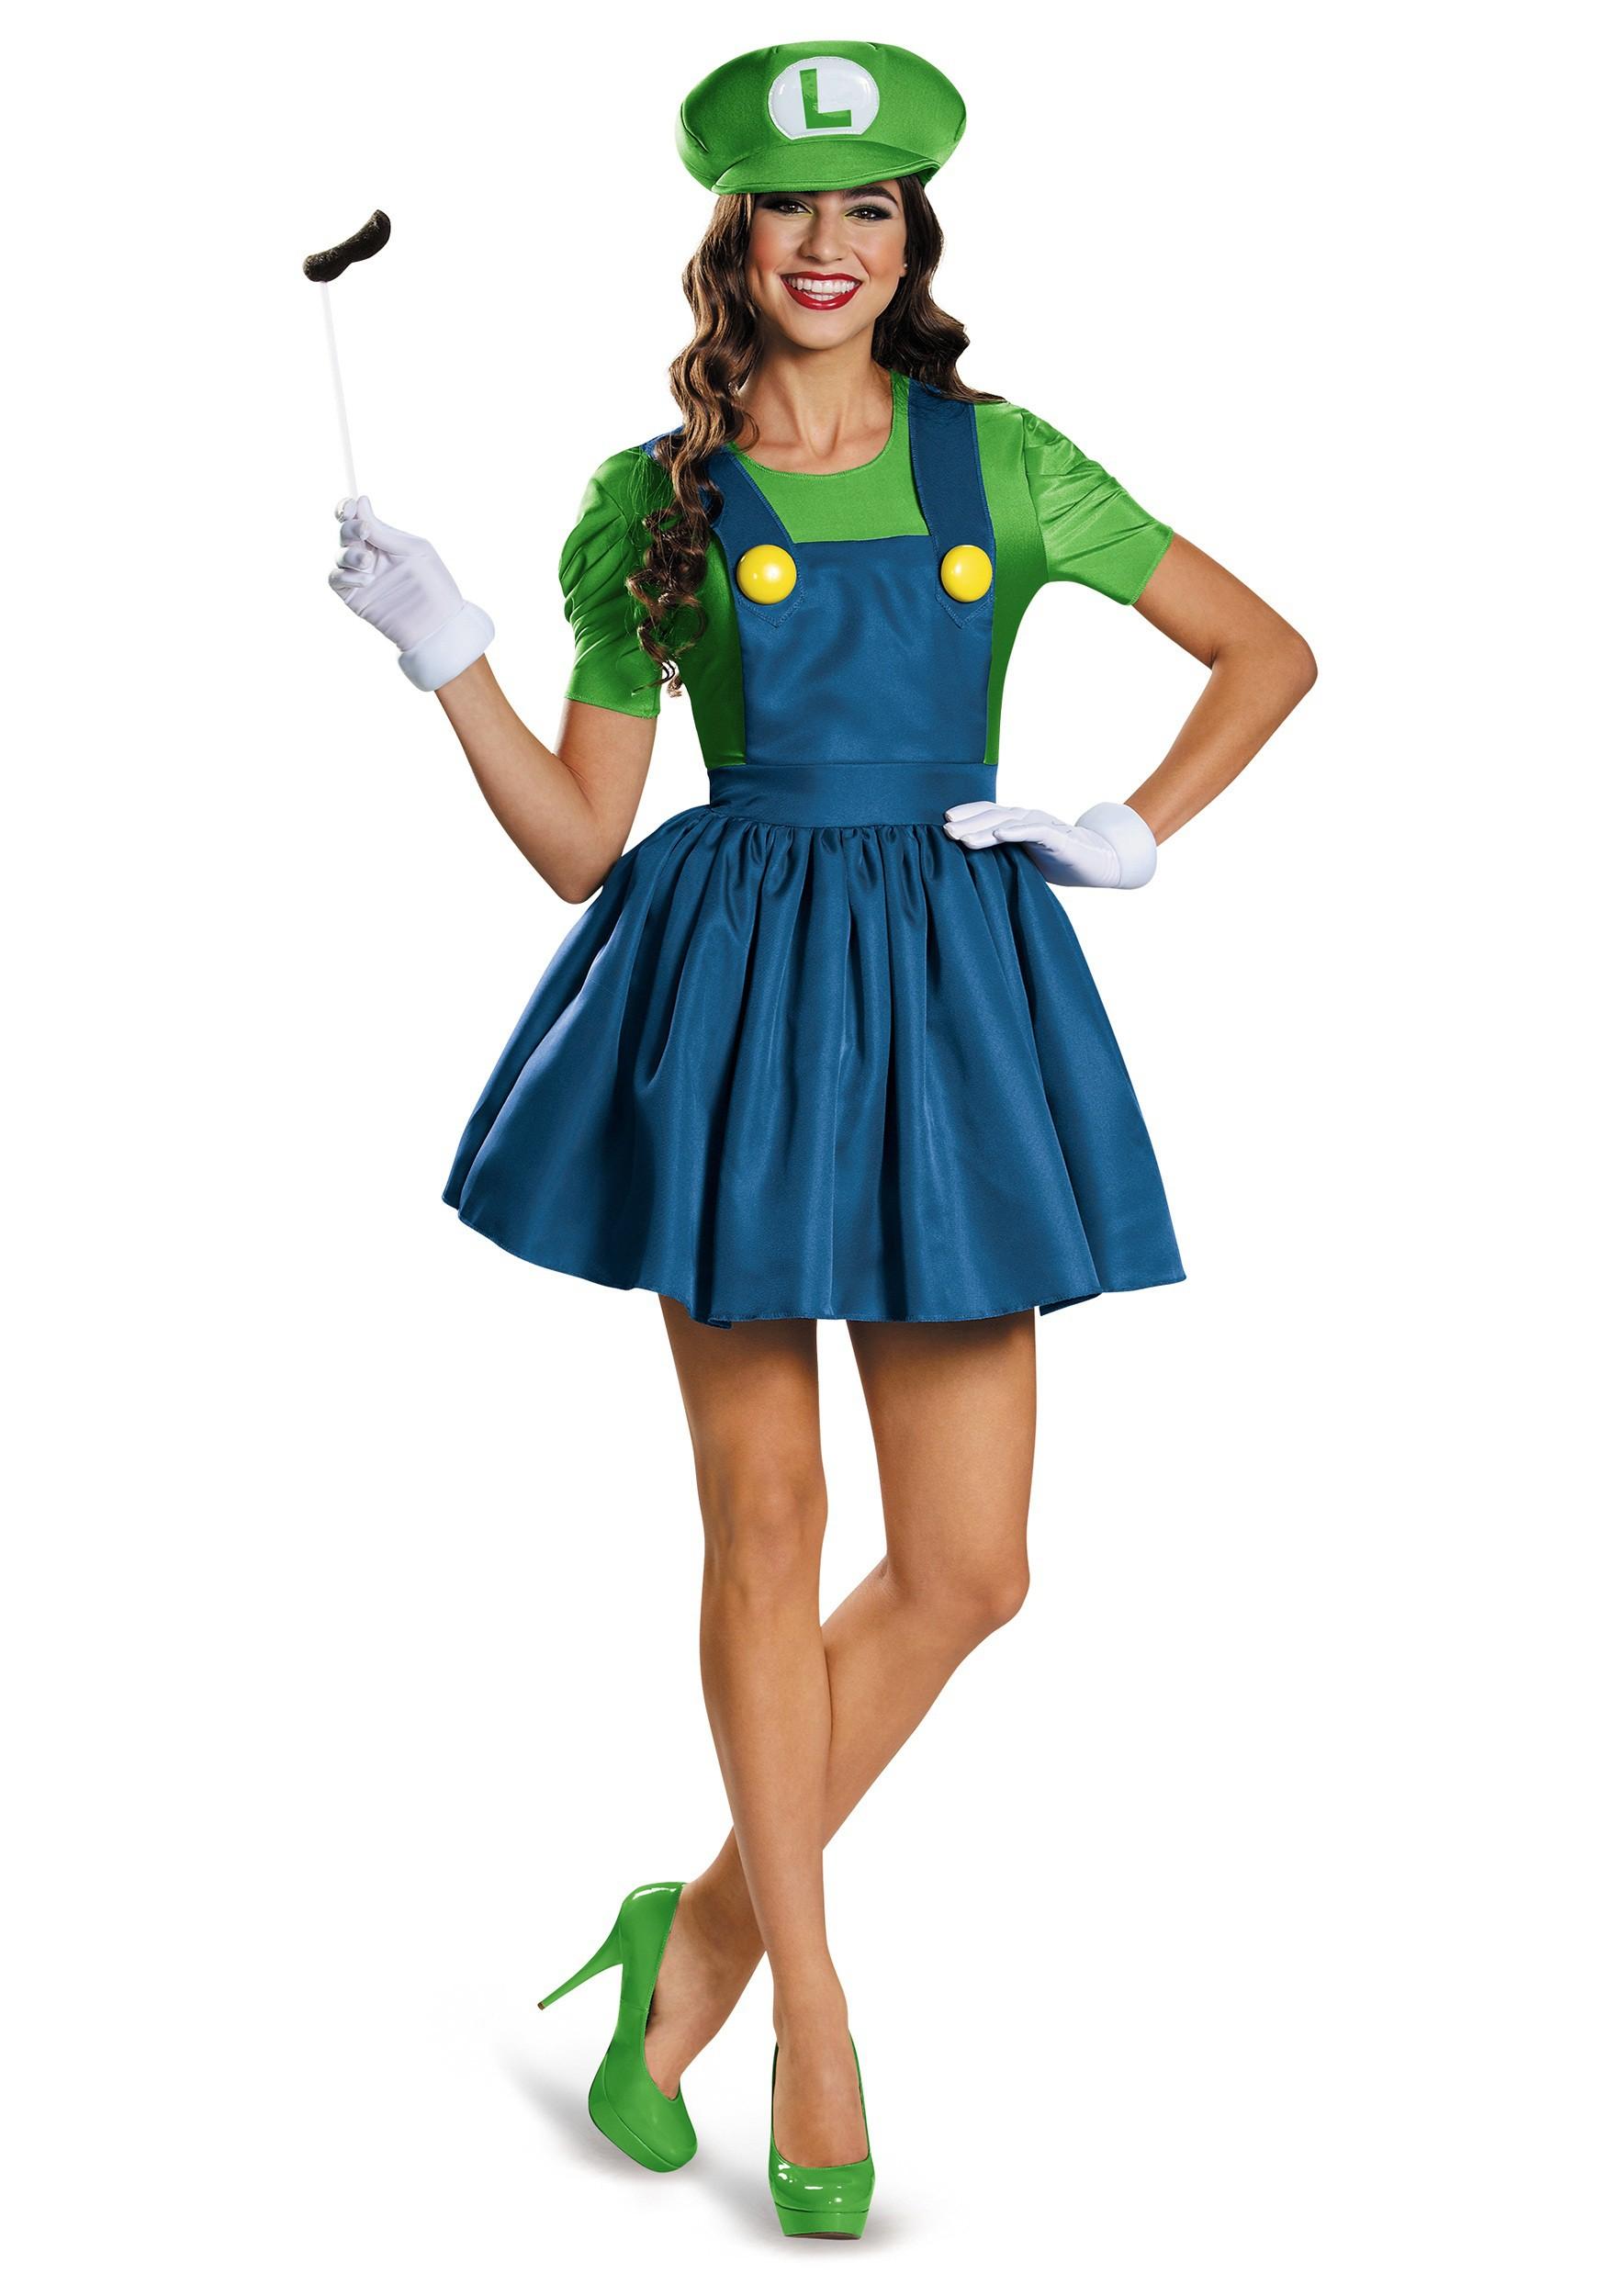 womens luigi dress costume - Koopa Troopa Halloween Costume